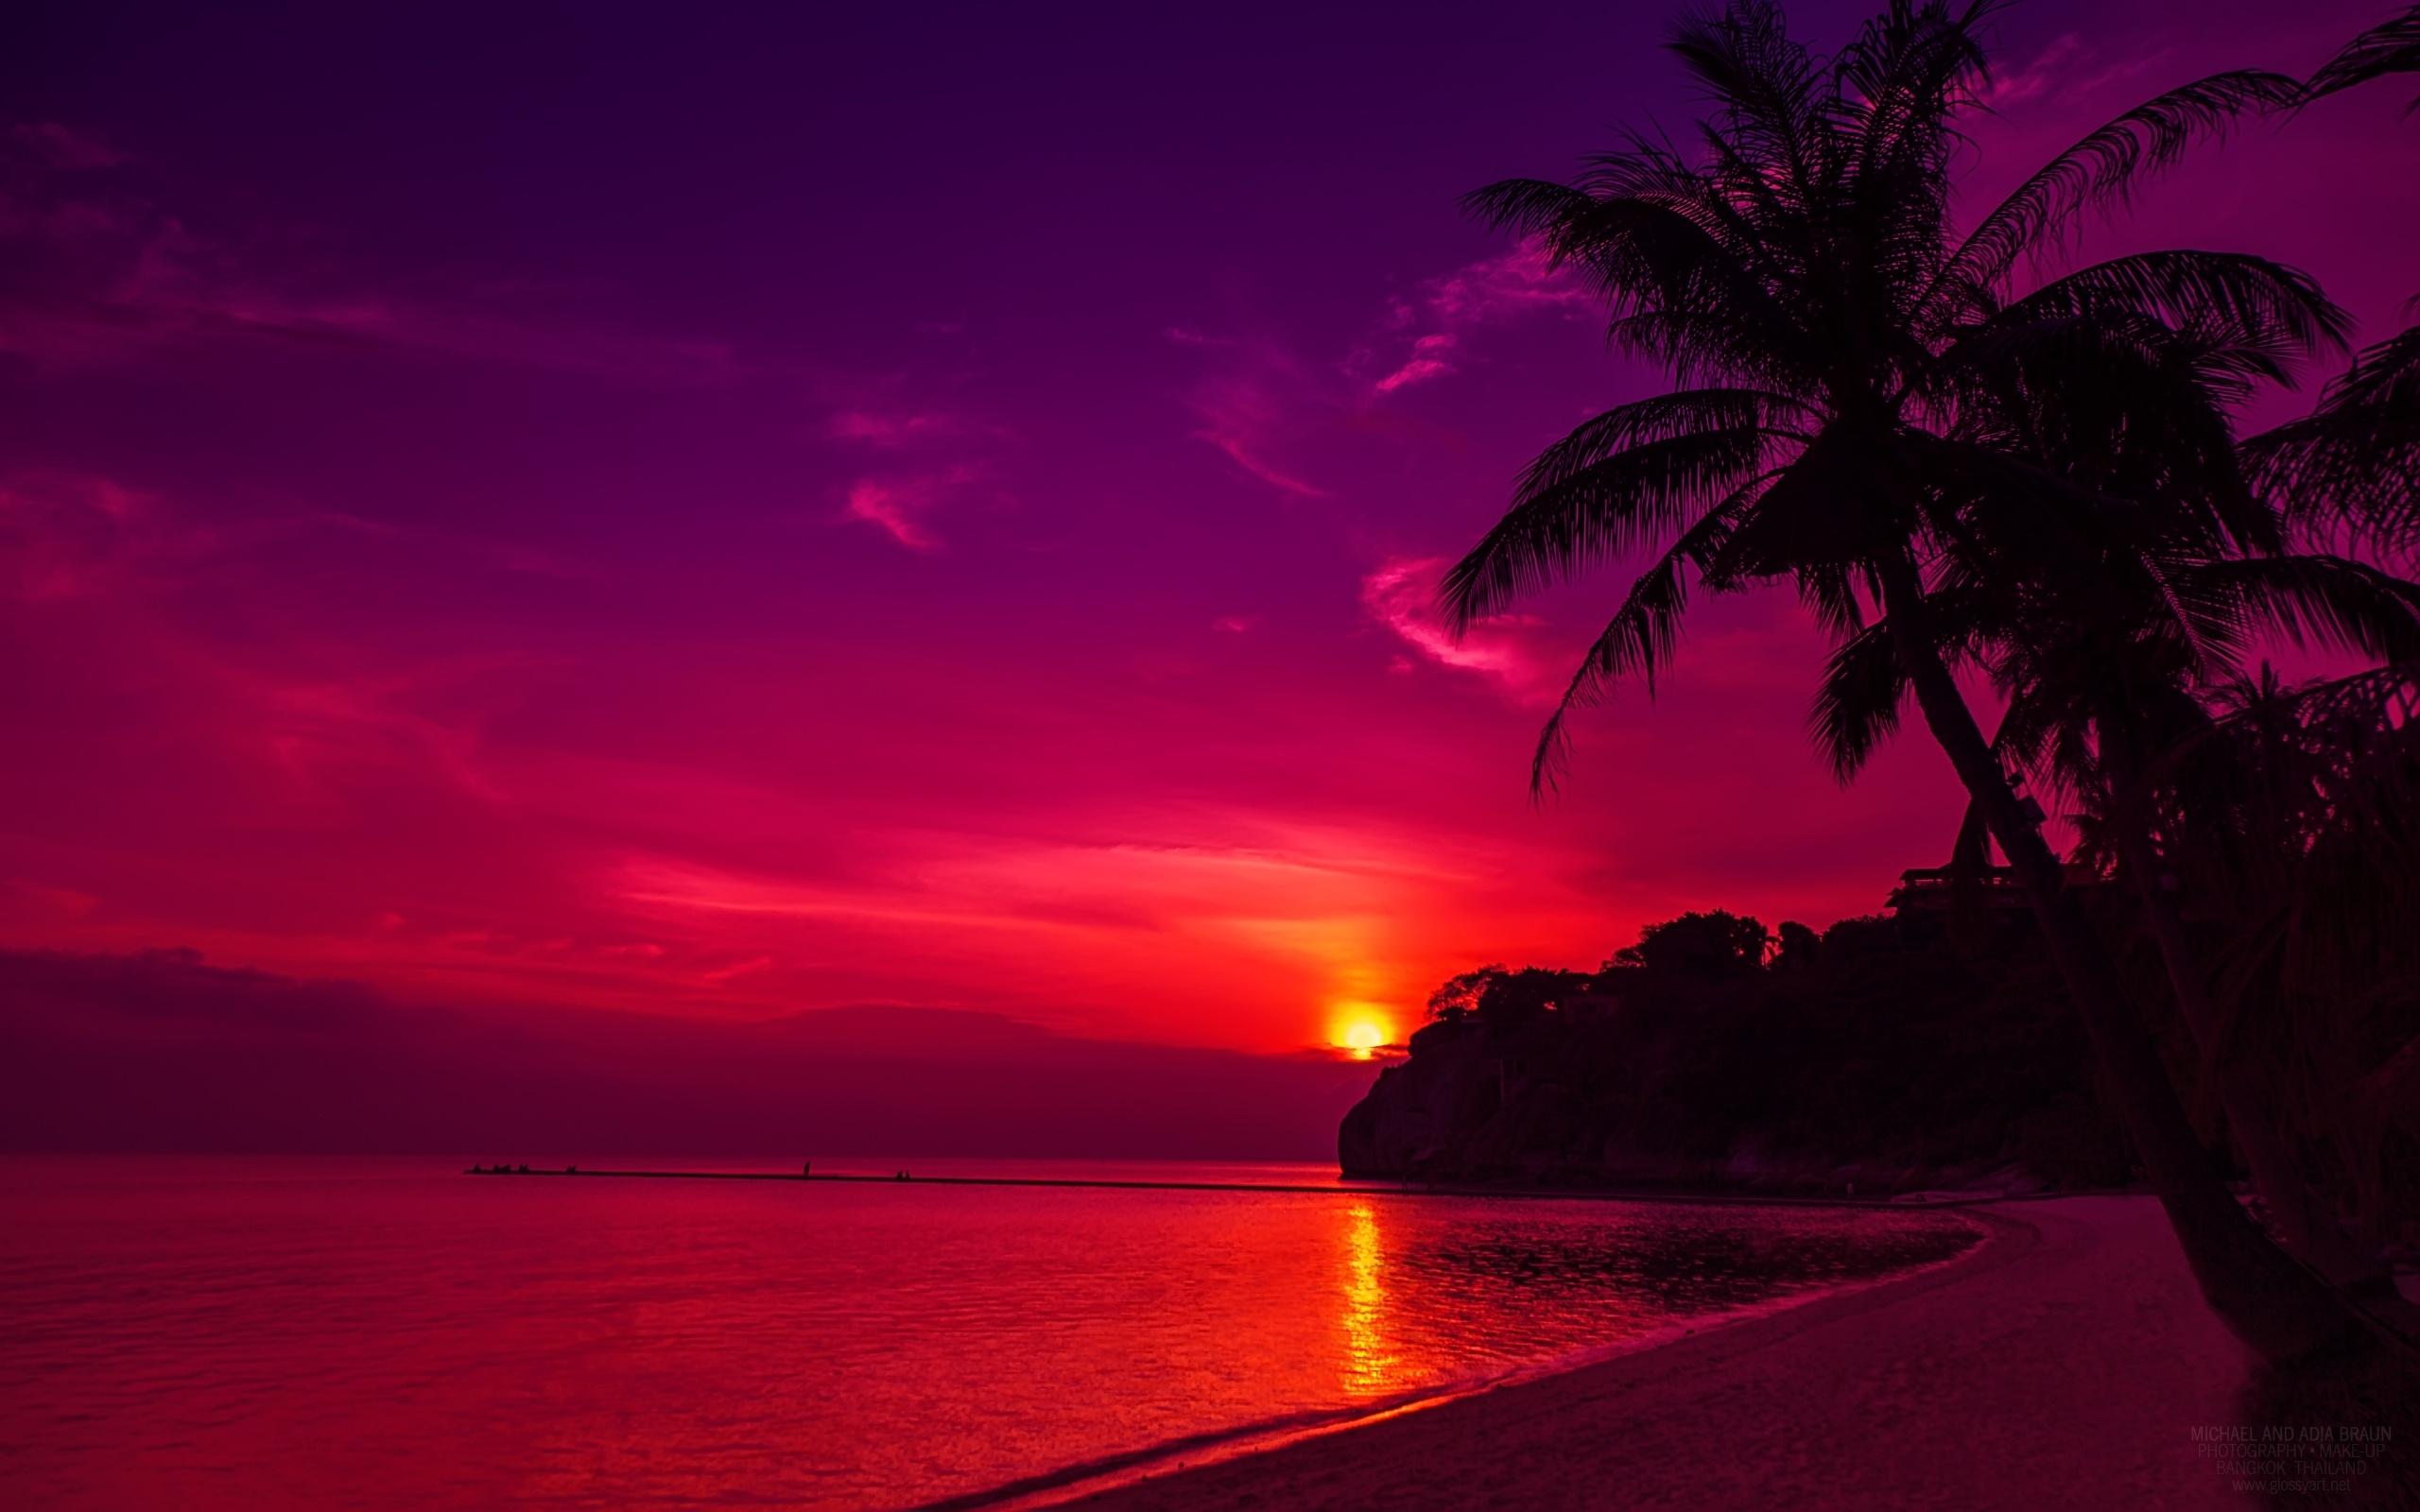 70 Beach Sunset Desktop Wallpaper On Wallpapersafari